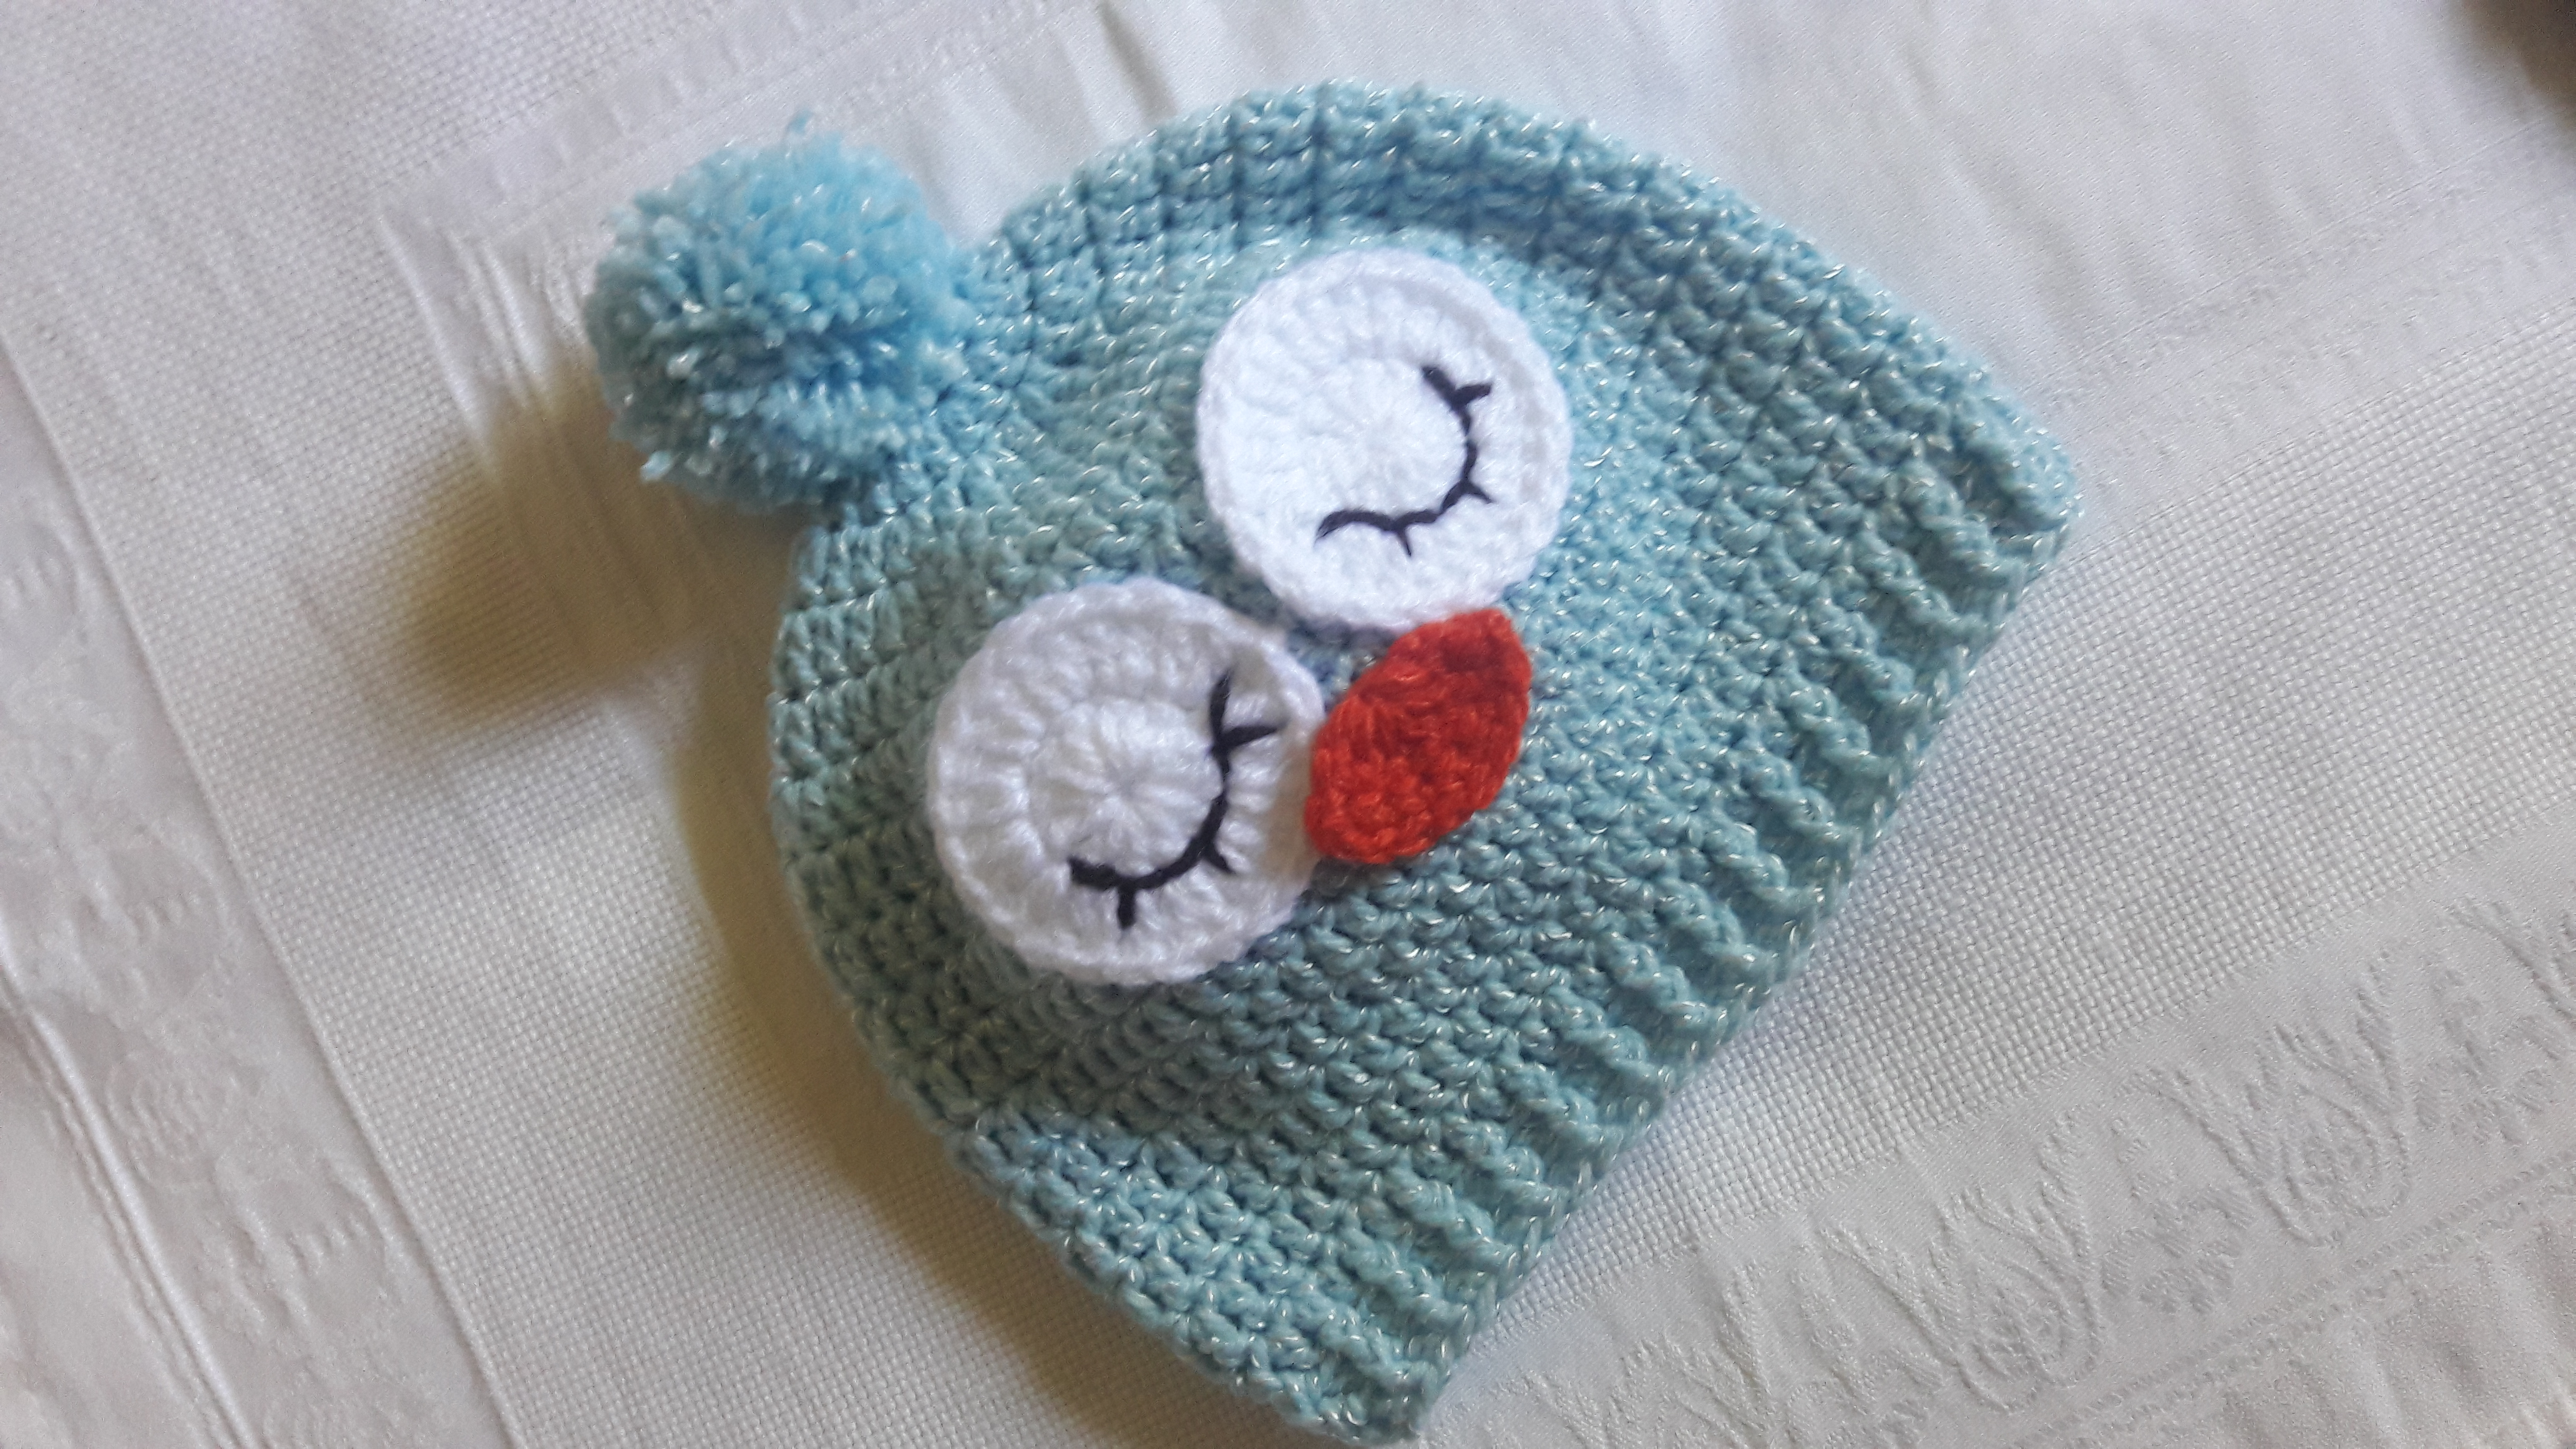 Compre 3 Leve 4 Touca de Croche Divertida Bichinhos  c5d883c2f61